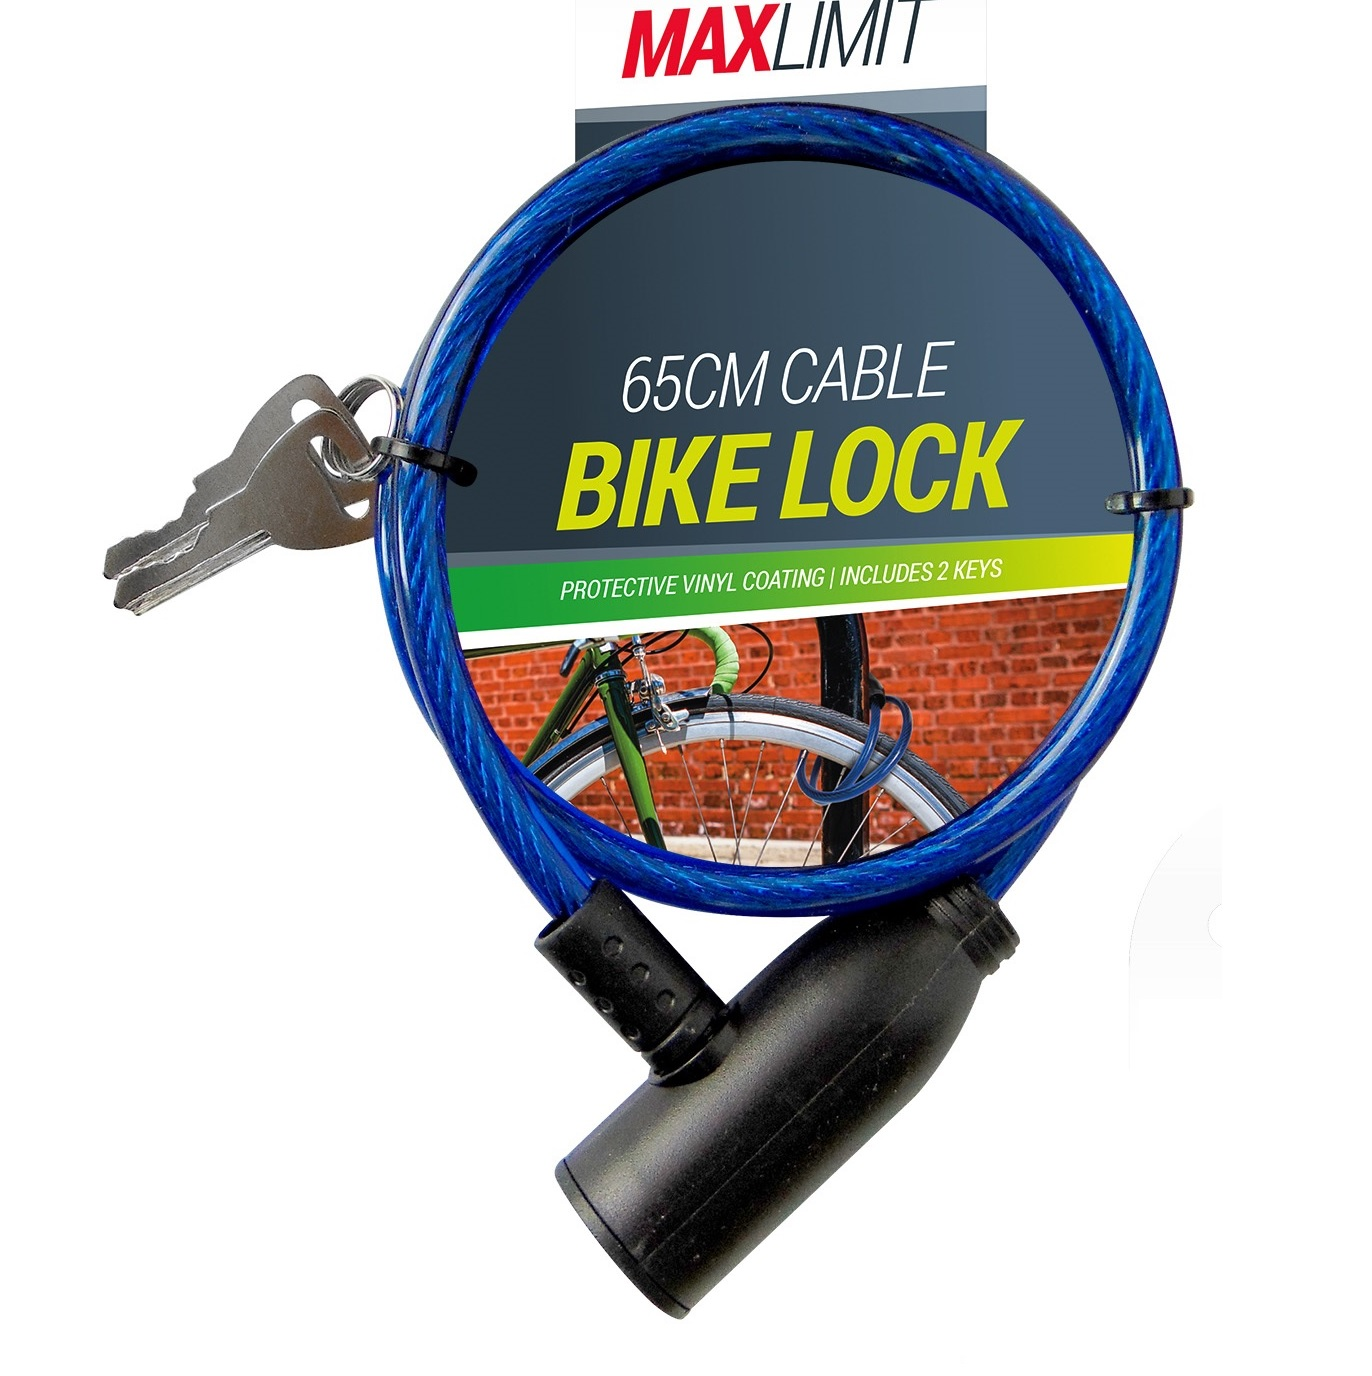 65cm Vinyl Steel Cable Bike Bicycle Cycle 2 Key Lock Car Trailer Security Seal